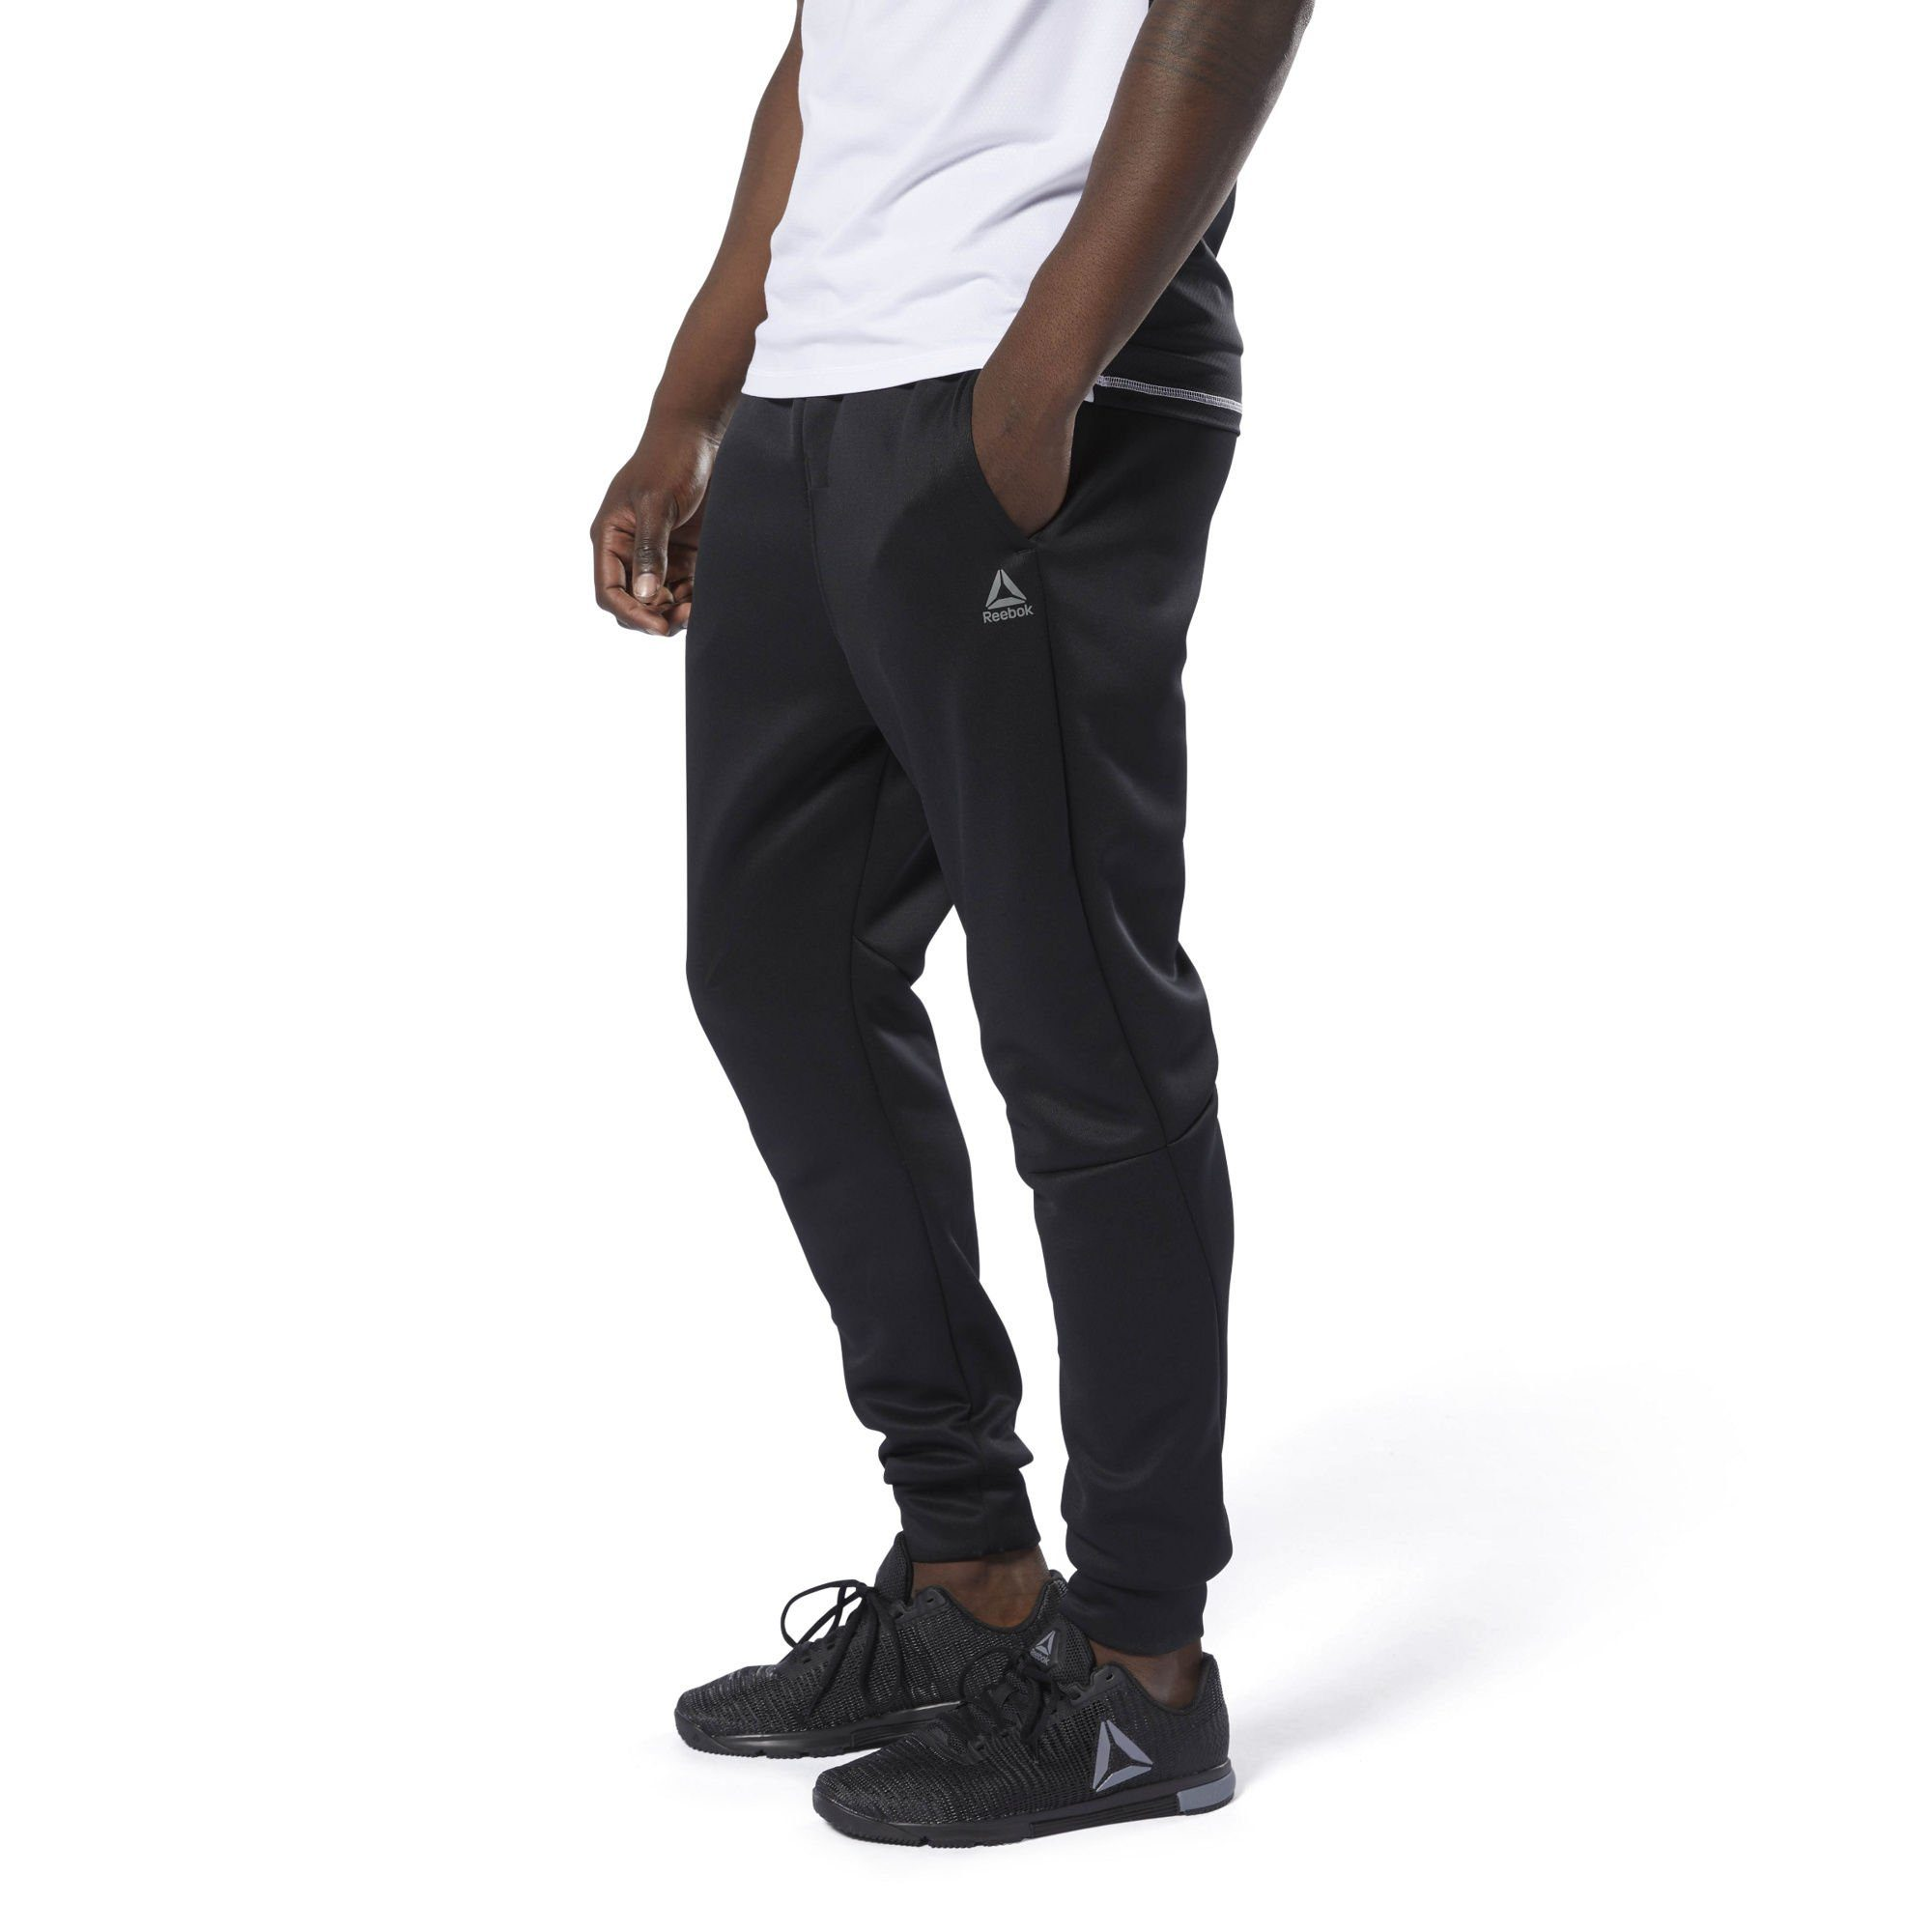 Reebok Sporthose »Training Spacer Pants« kaufen | OTTO